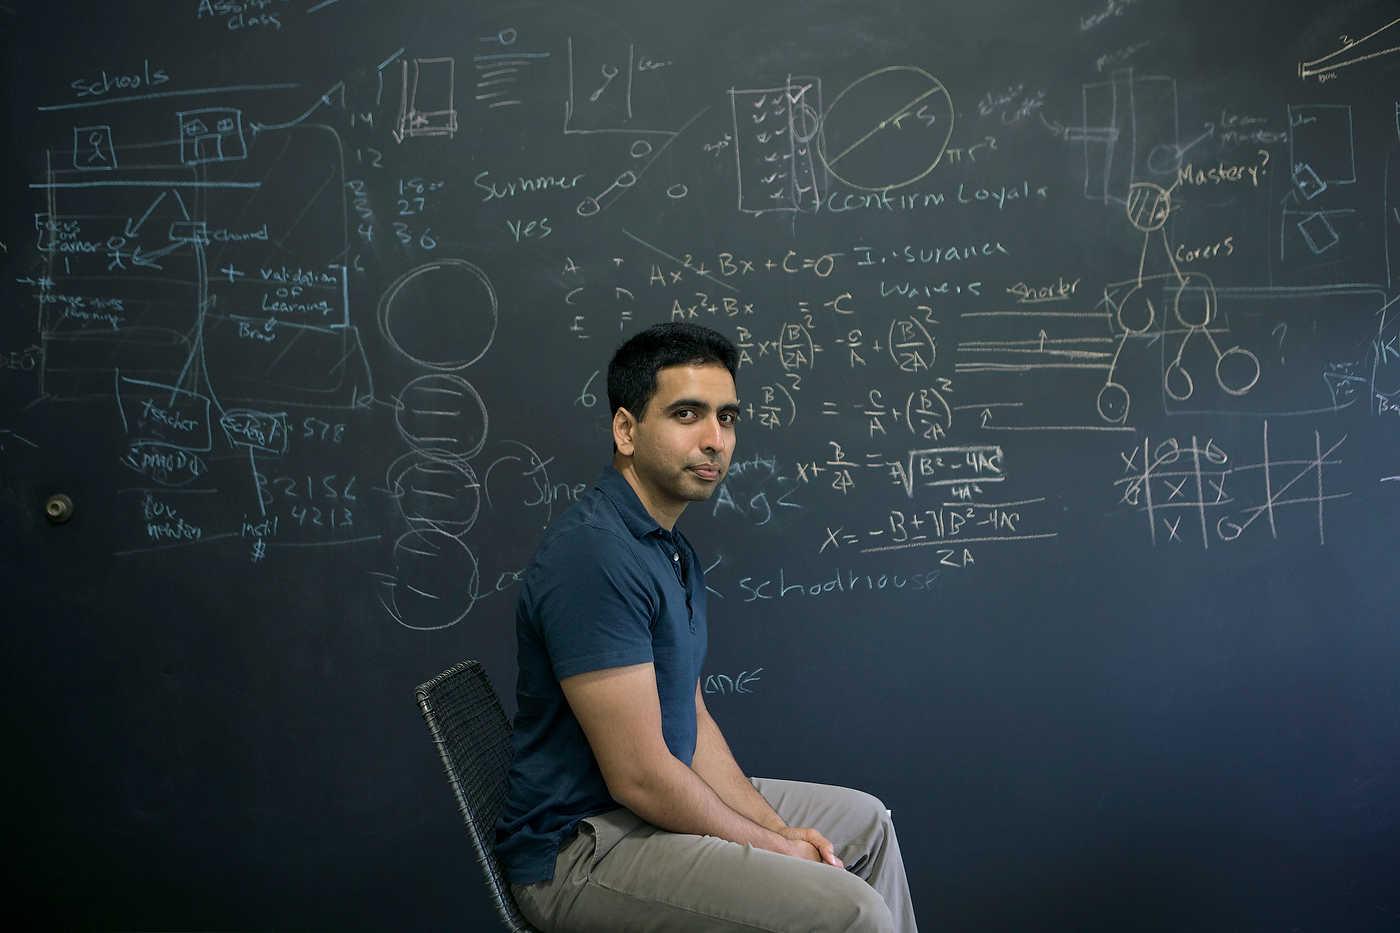 Salman Khan: el hombre que revolucionó la educación en Internet